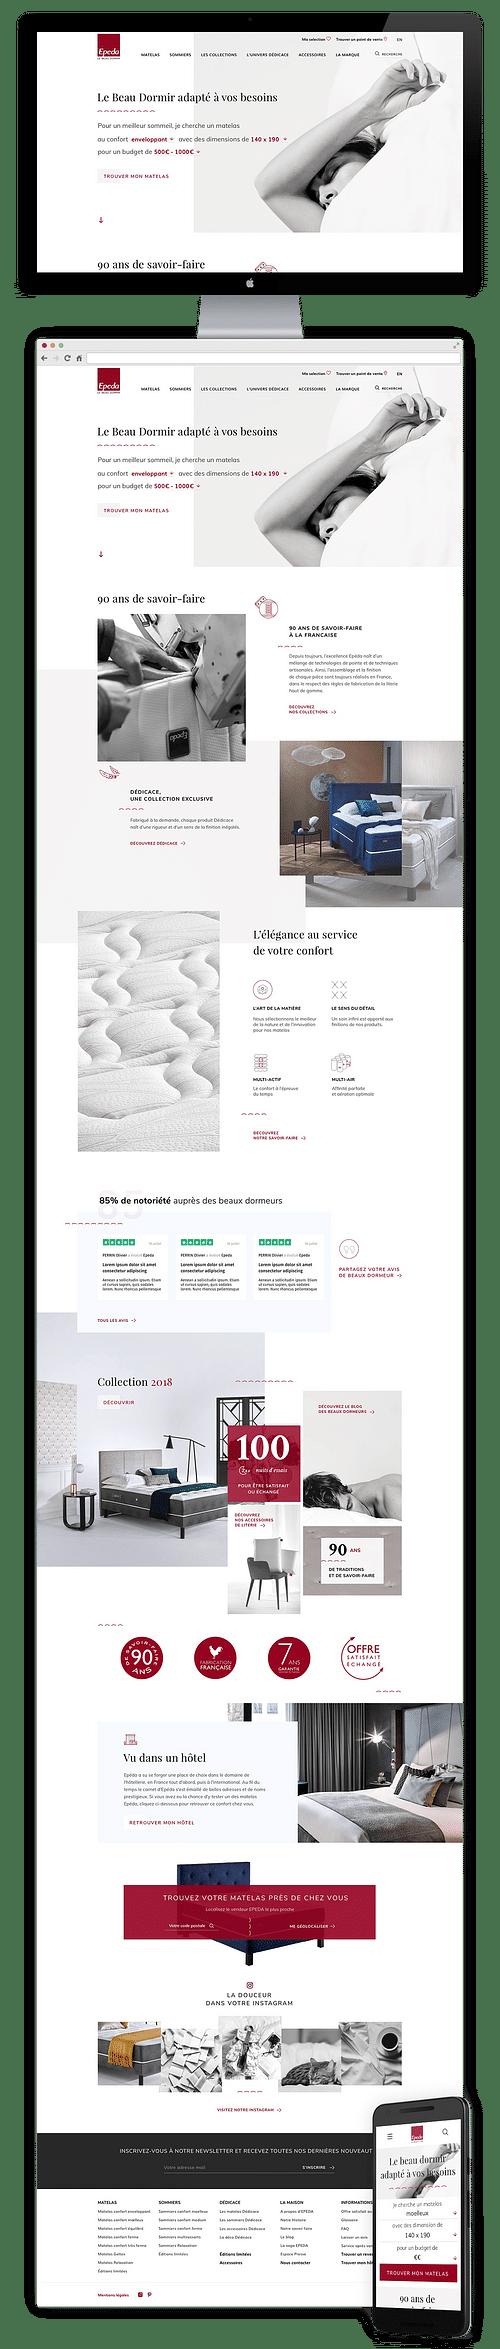 Refonte site Epeda - Création de site internet